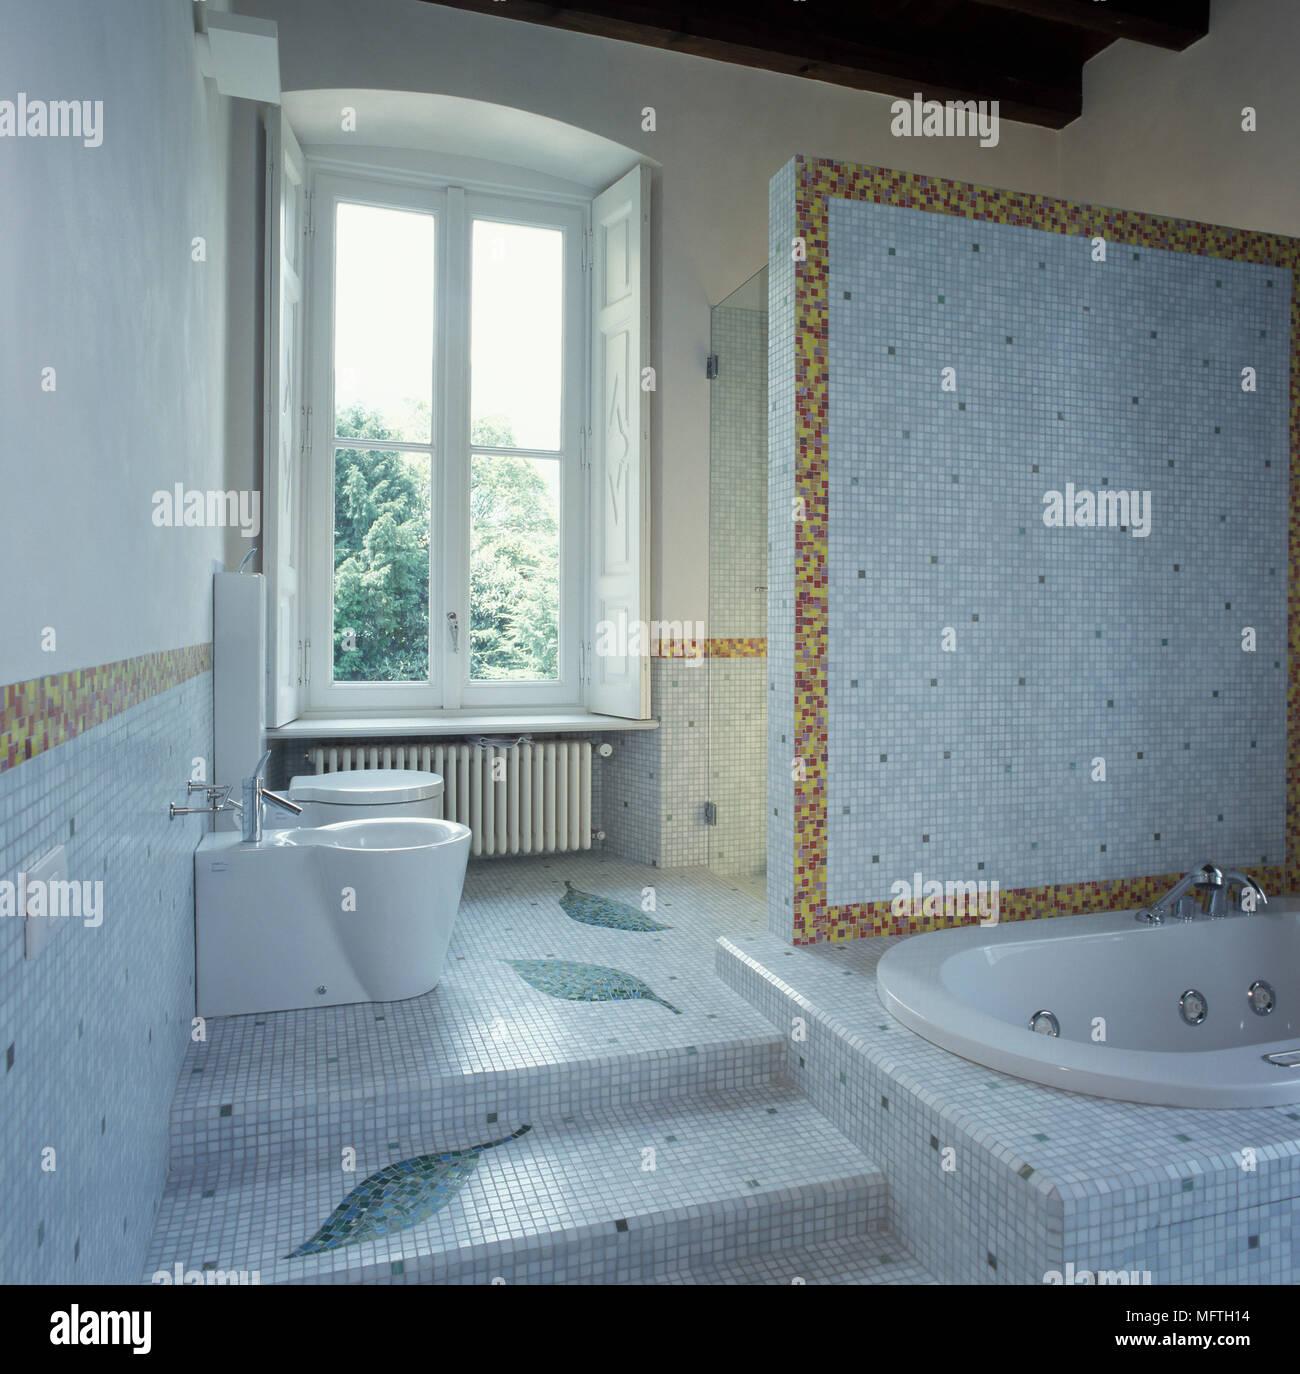 Bathtub Surround Stock Photos & Bathtub Surround Stock Images - Alamy